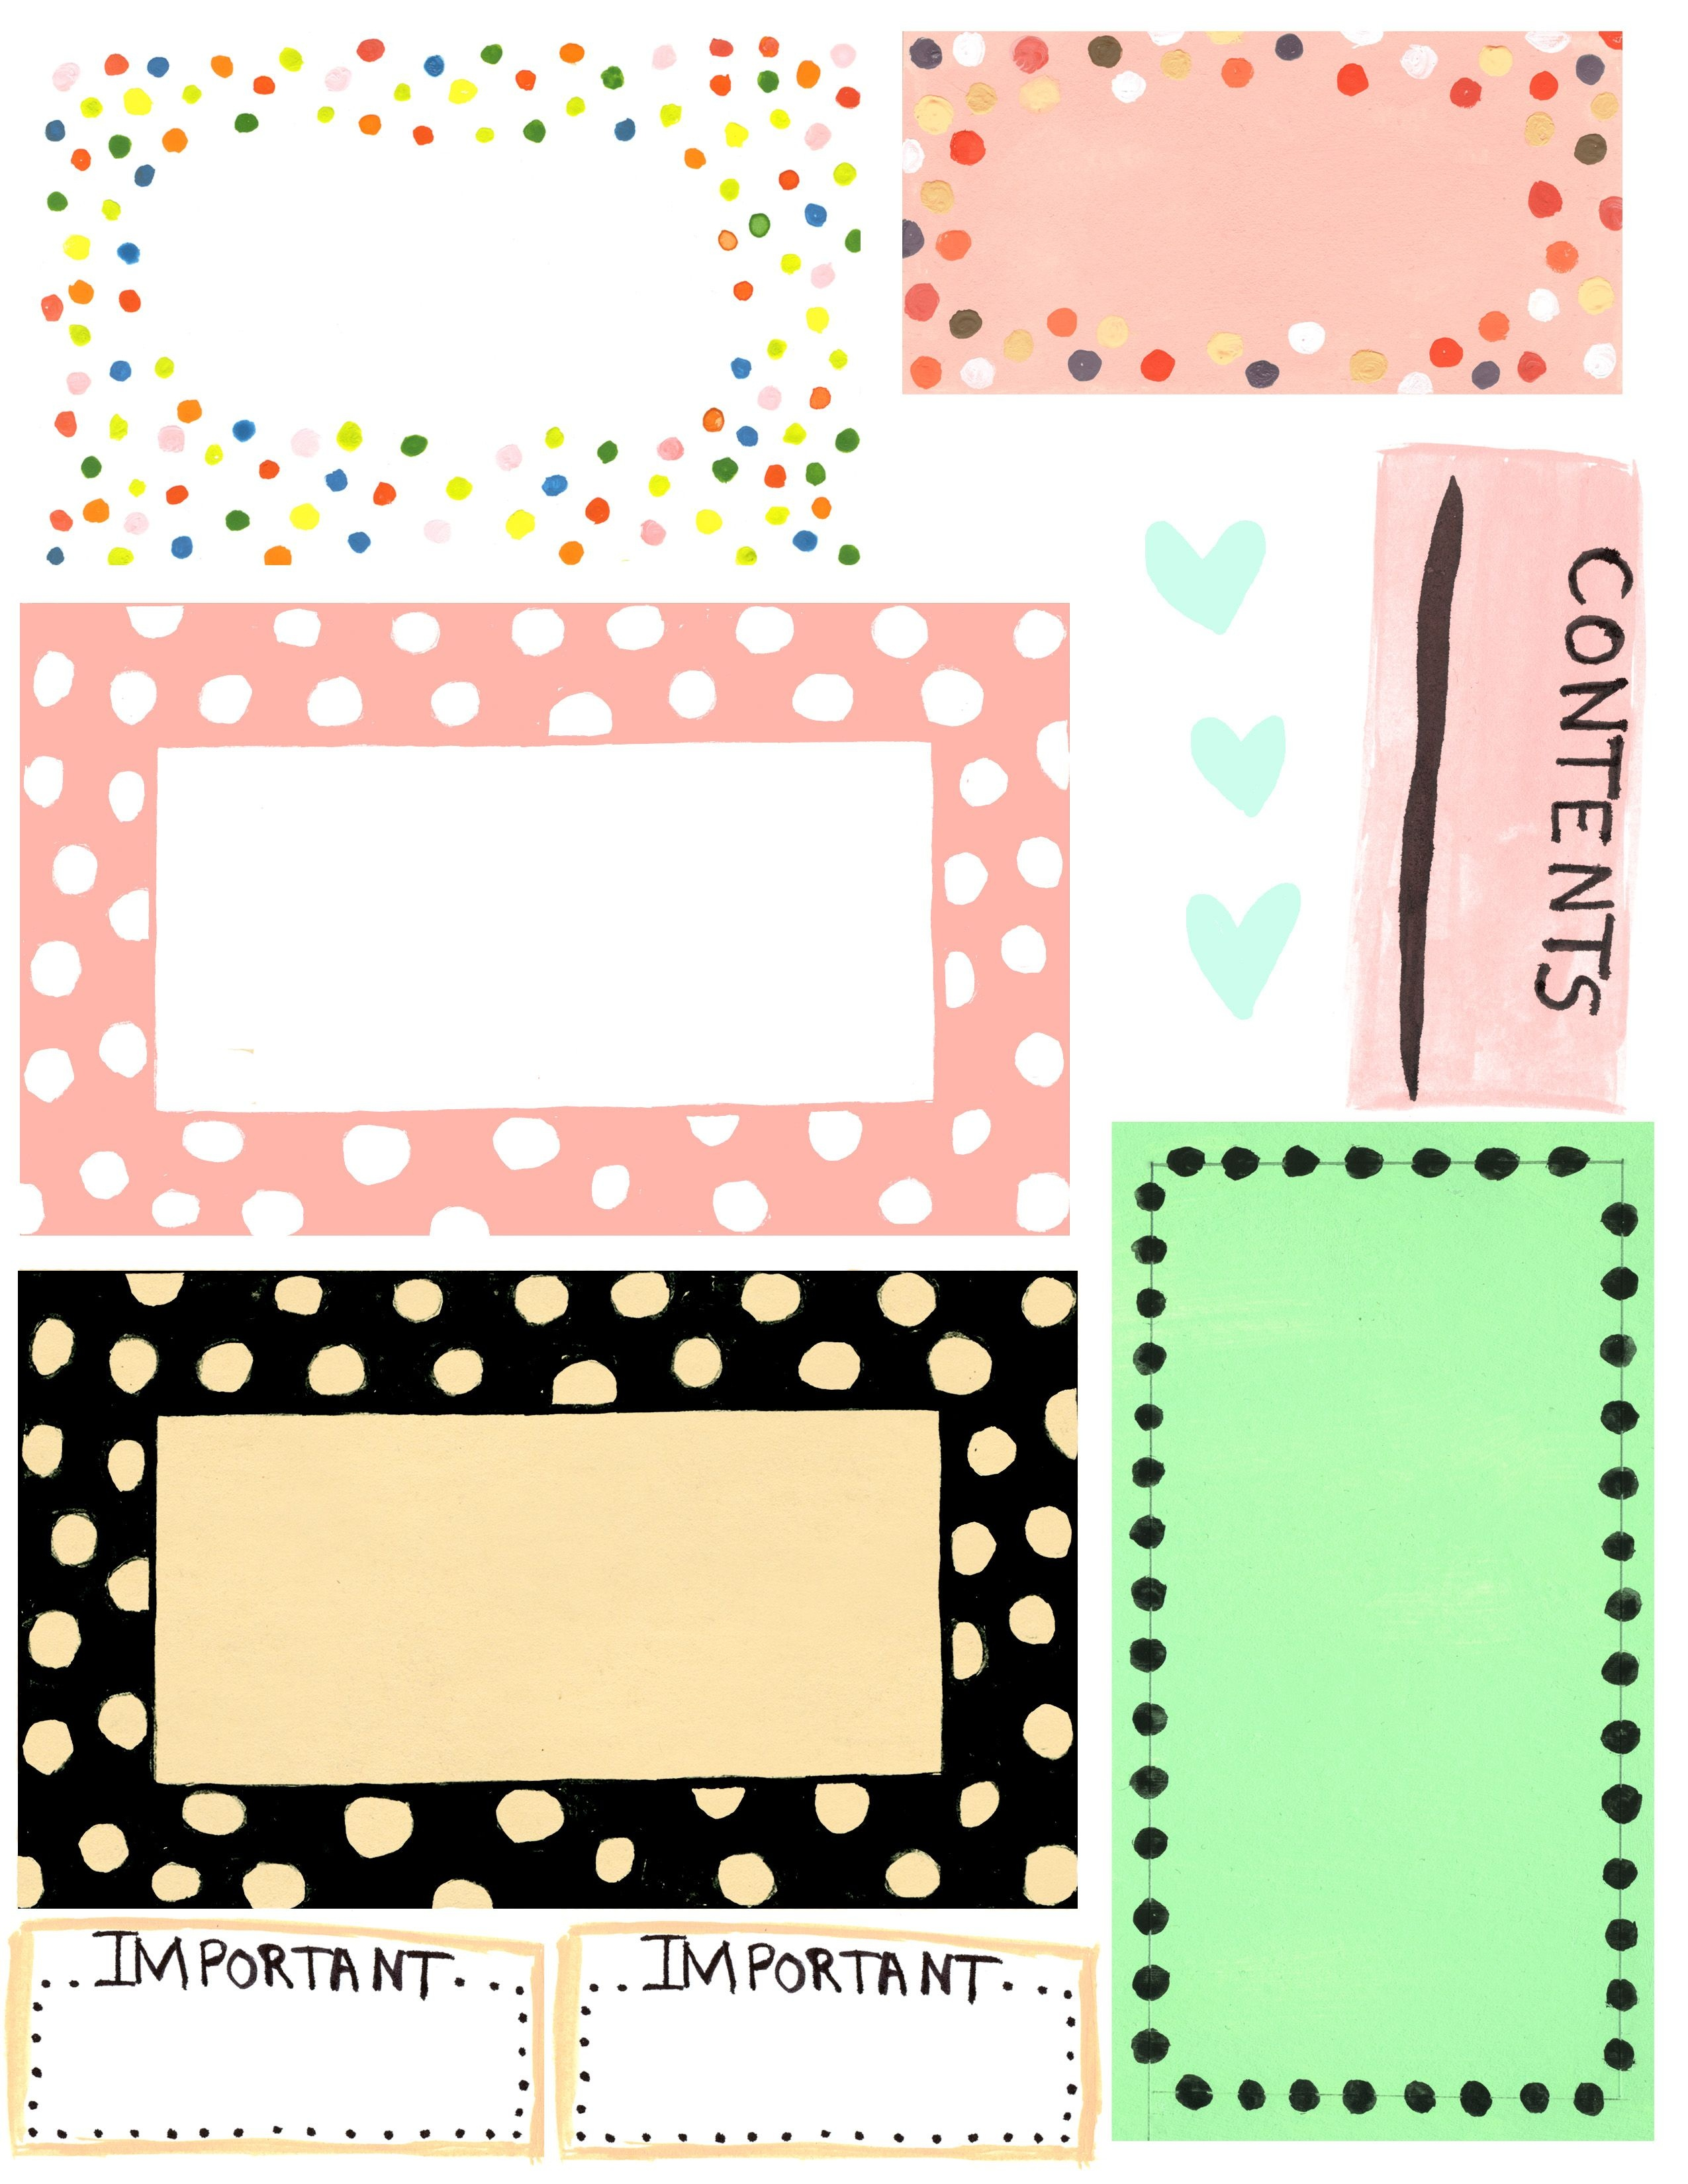 Free Printable Label Design Template Cakepins | Christmas Place - Free Printable Label Templates